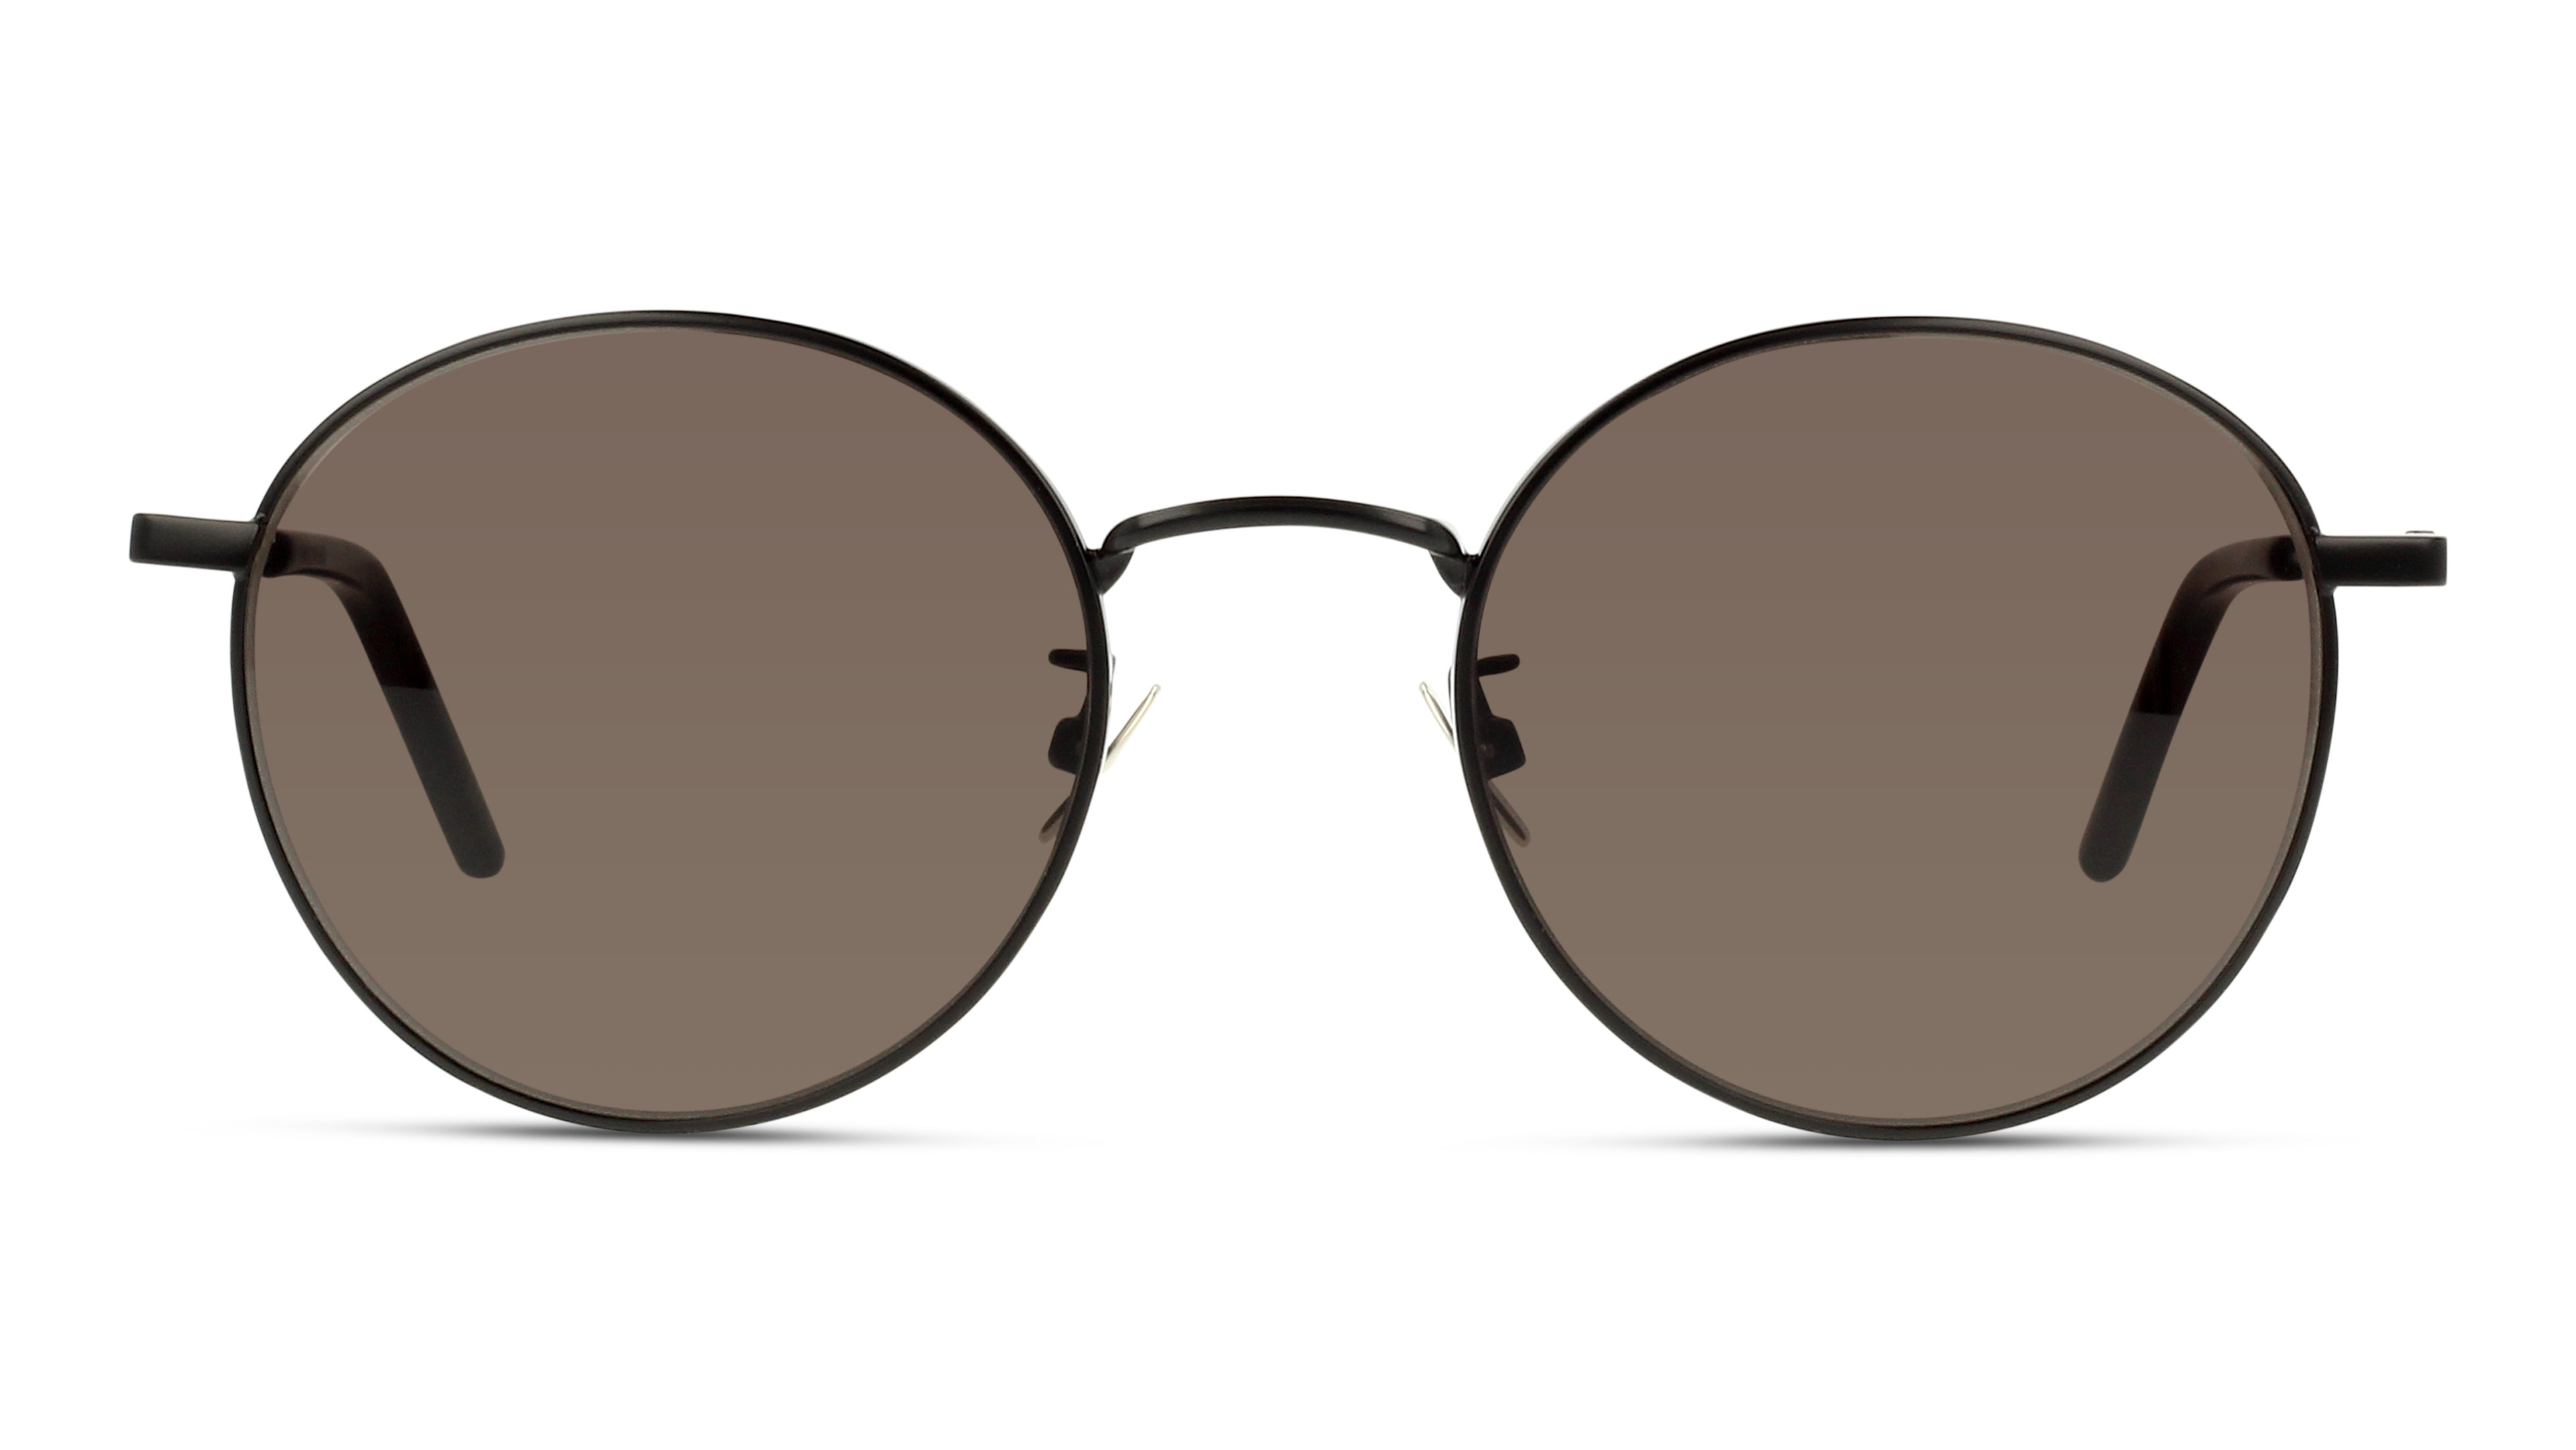 8056376208351-front-01-saint-laurent-sl_250-eyewear-black-black-black